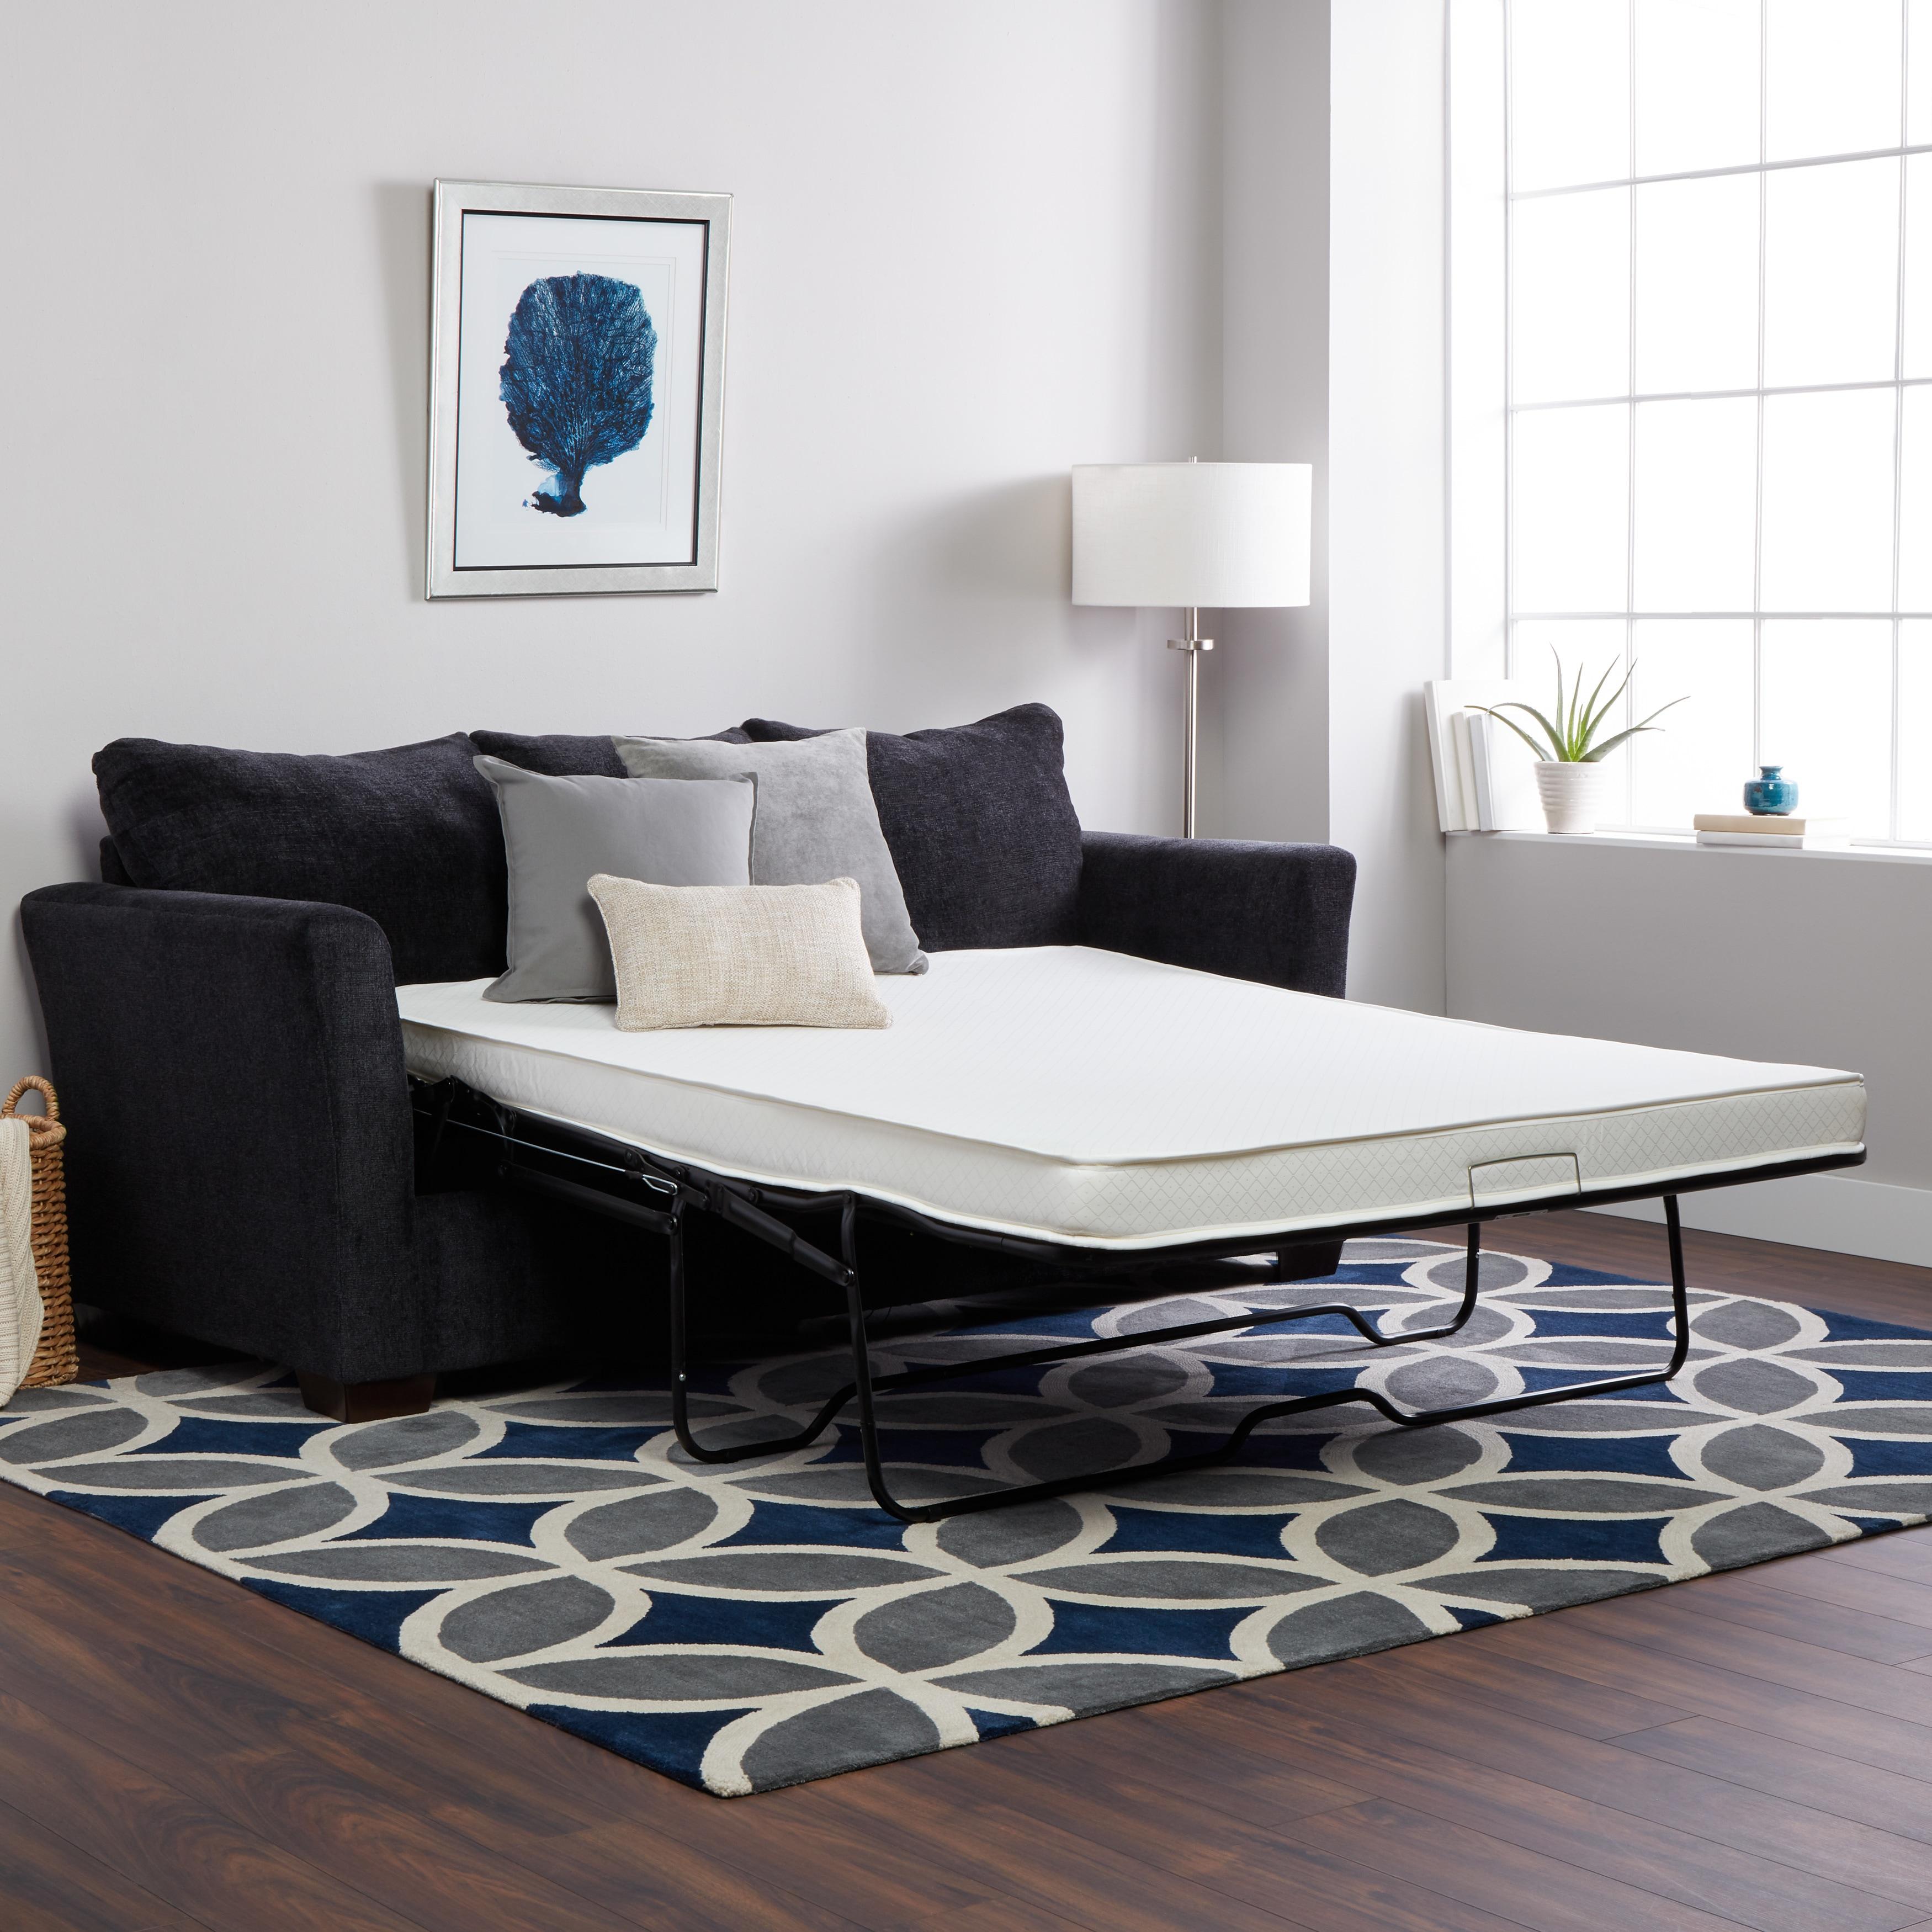 Shop Select Luxury Flippable 4 Inch Full Size Foam Sofa Sleeper